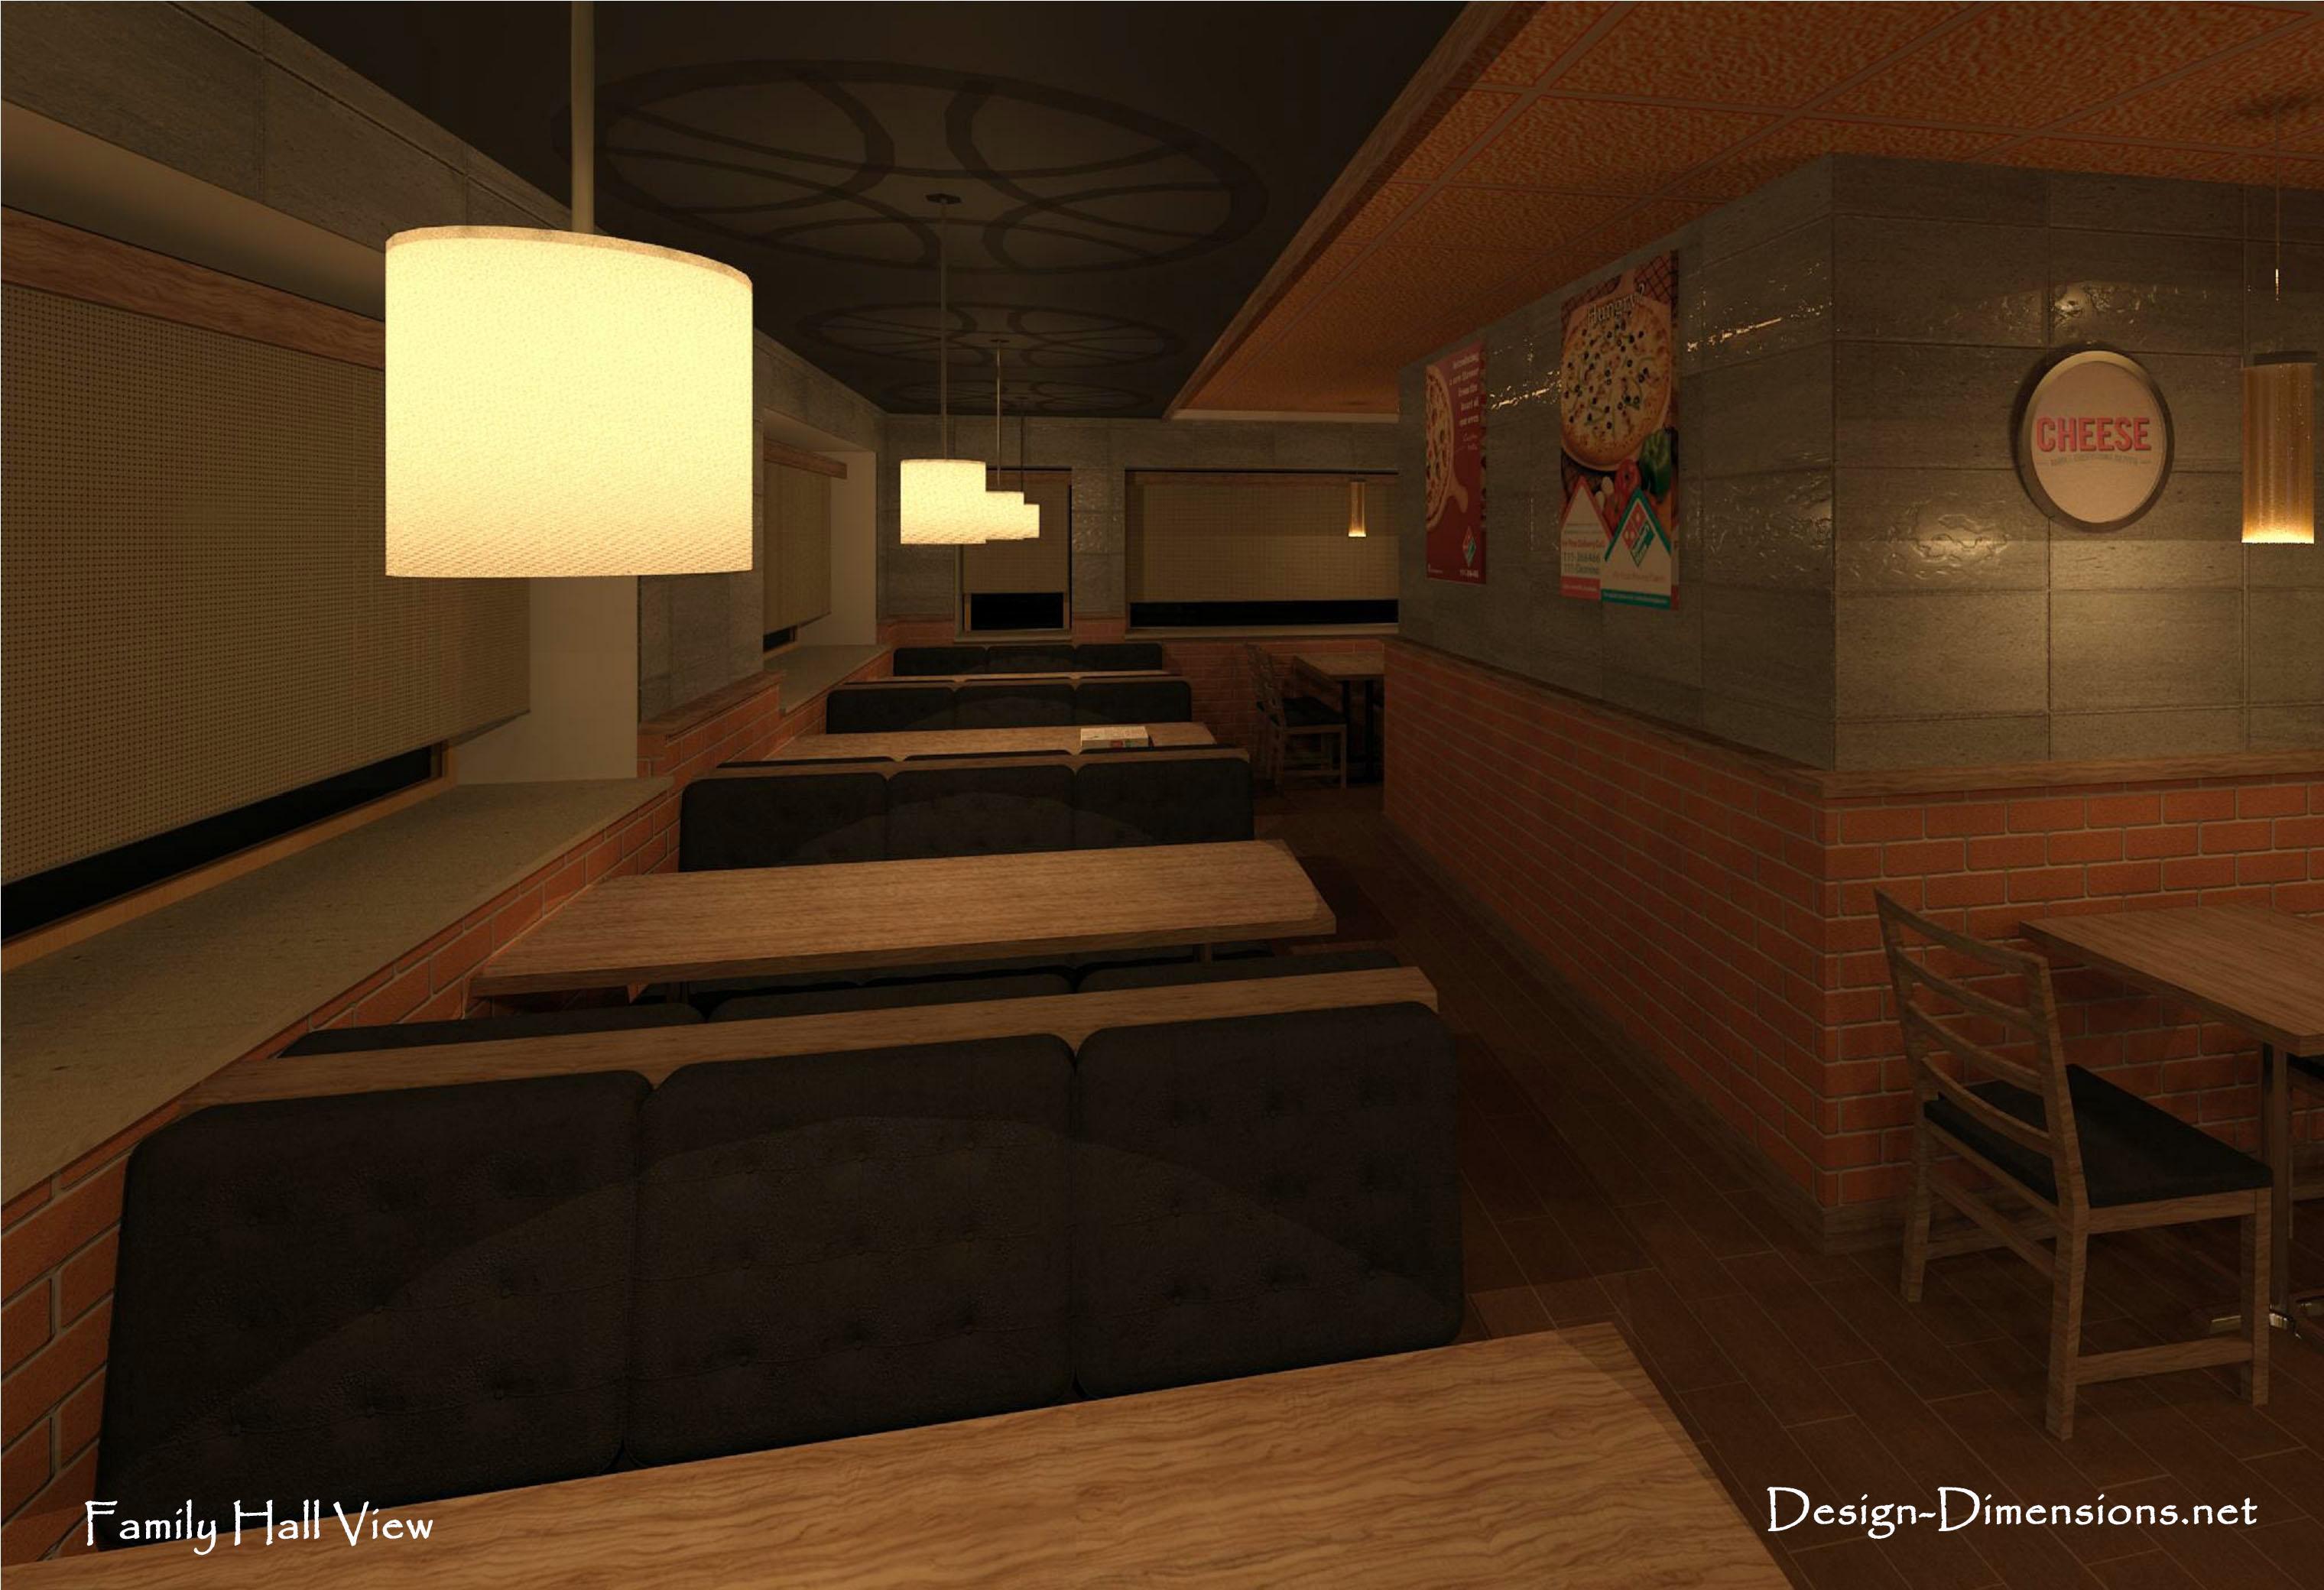 https://design-dimensions.net/public/uploads/1604825775_Dominos-Pizza-14.jpg